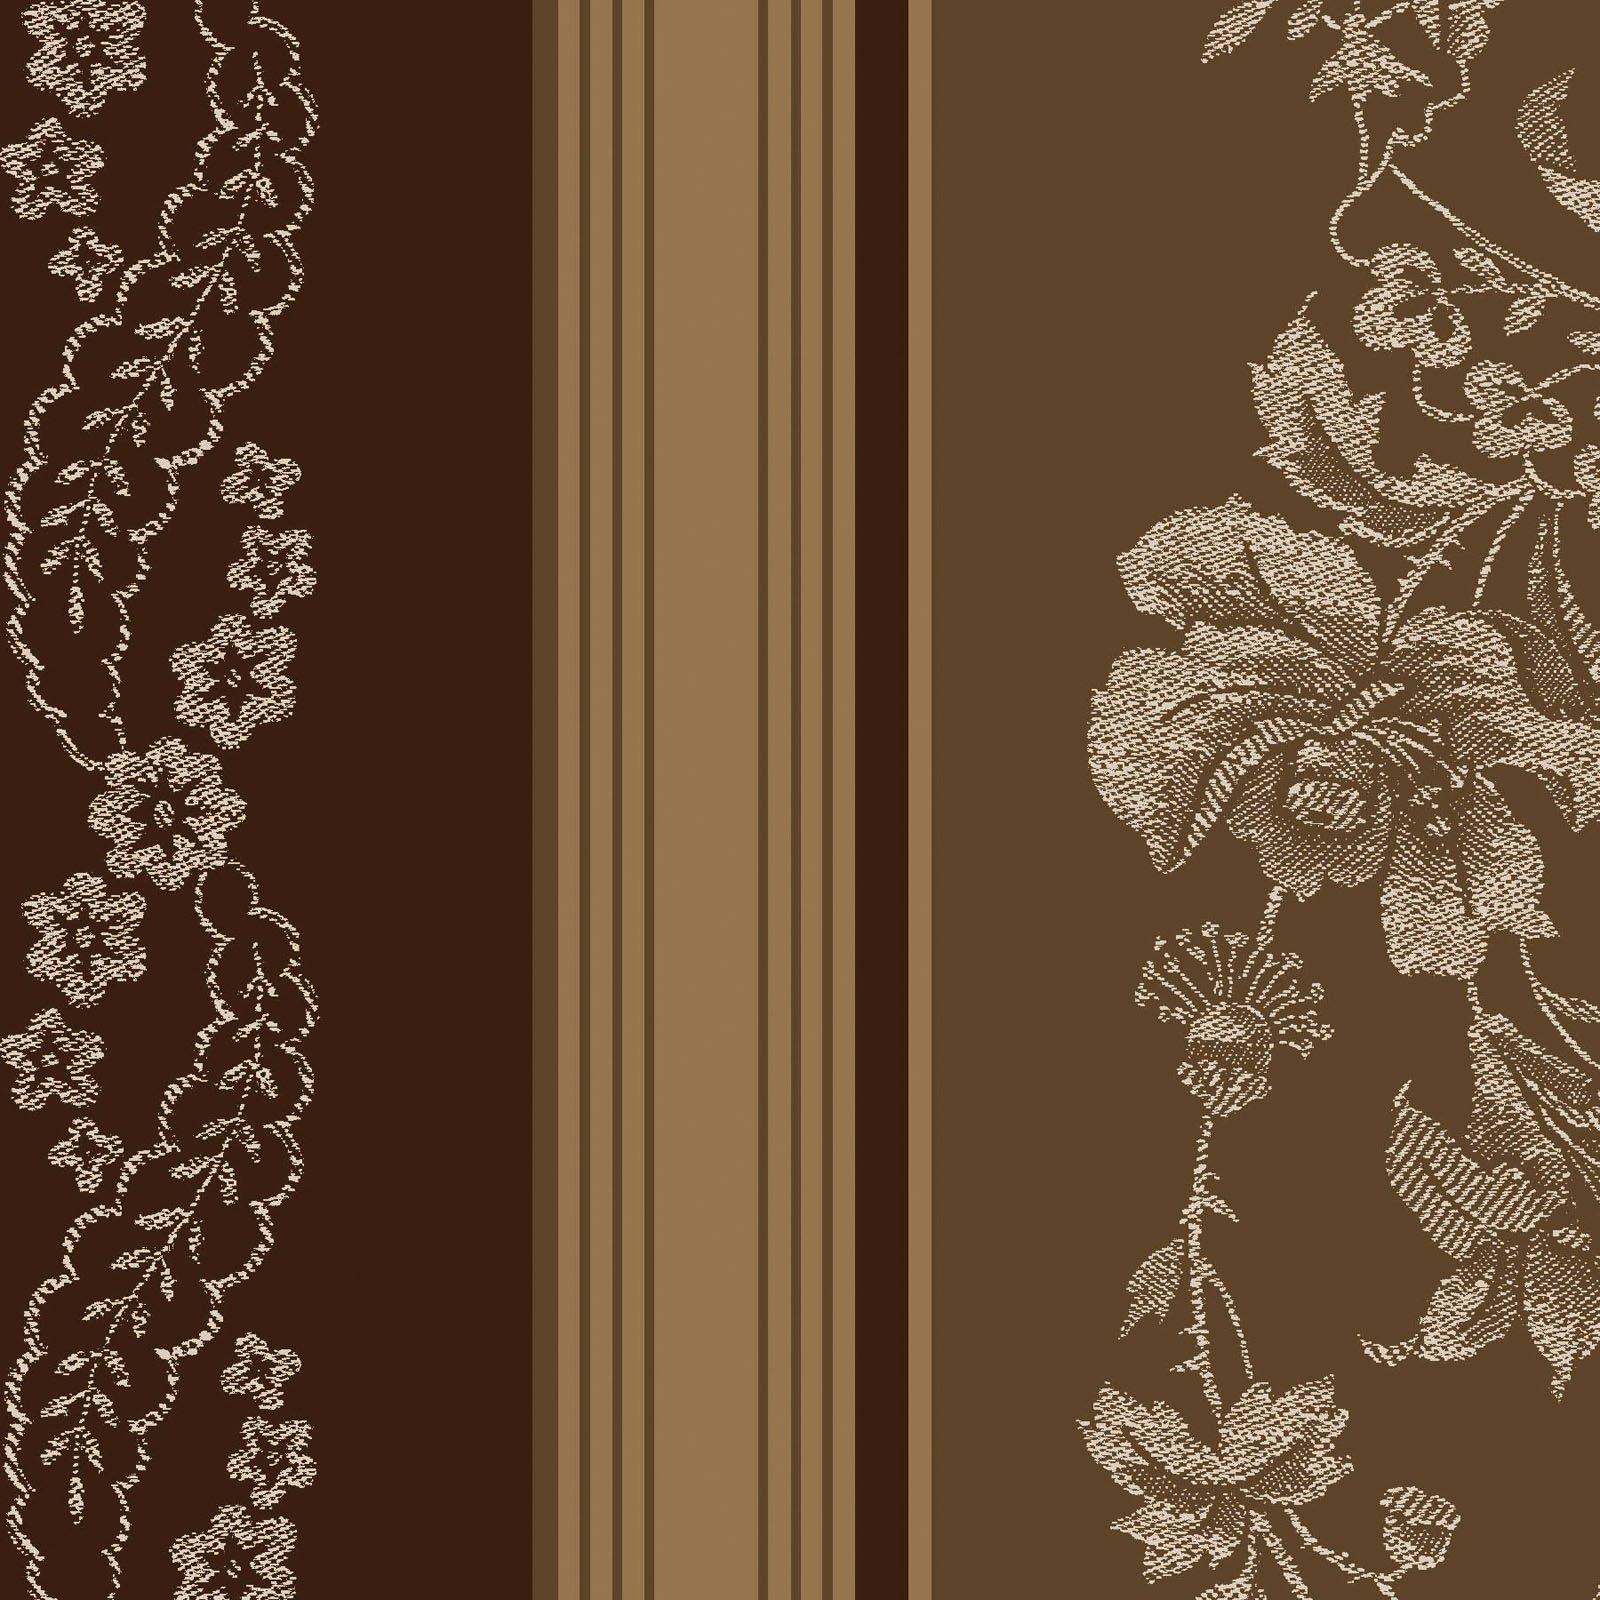 Ruby - Jacquard Texture Stripe -Brown